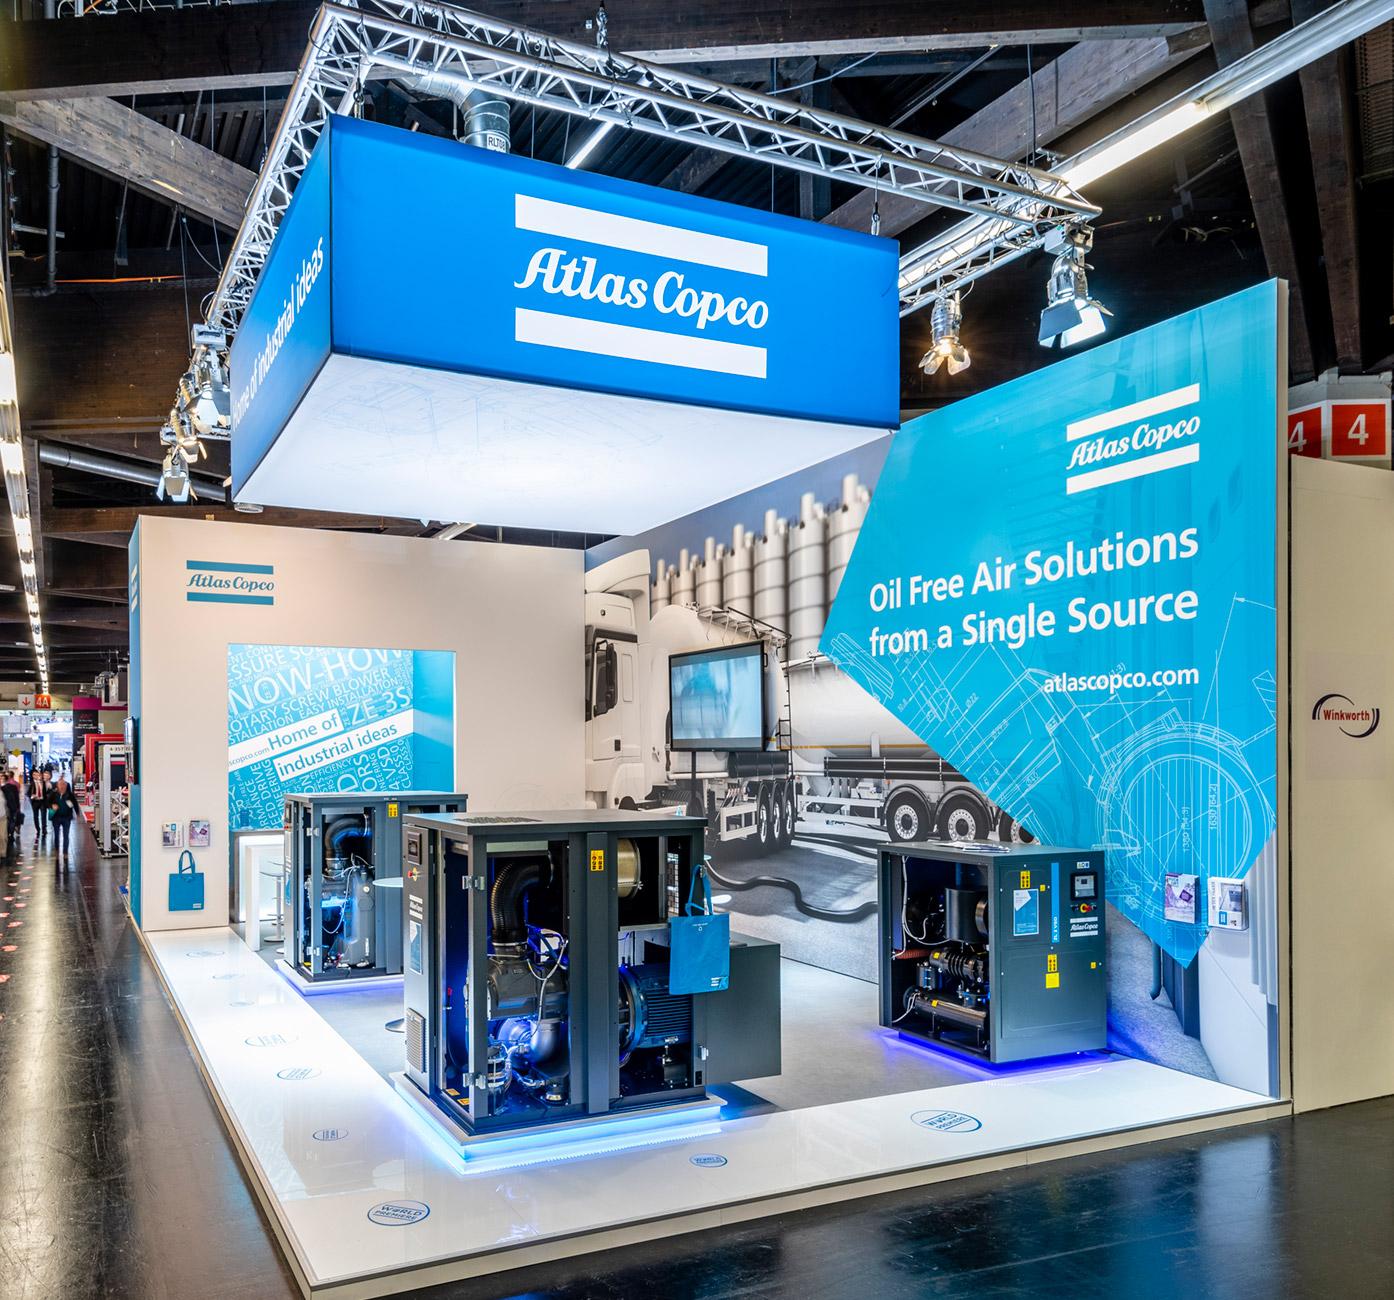 Messestand Atlas Copco Powtech 2019 Nürnberg